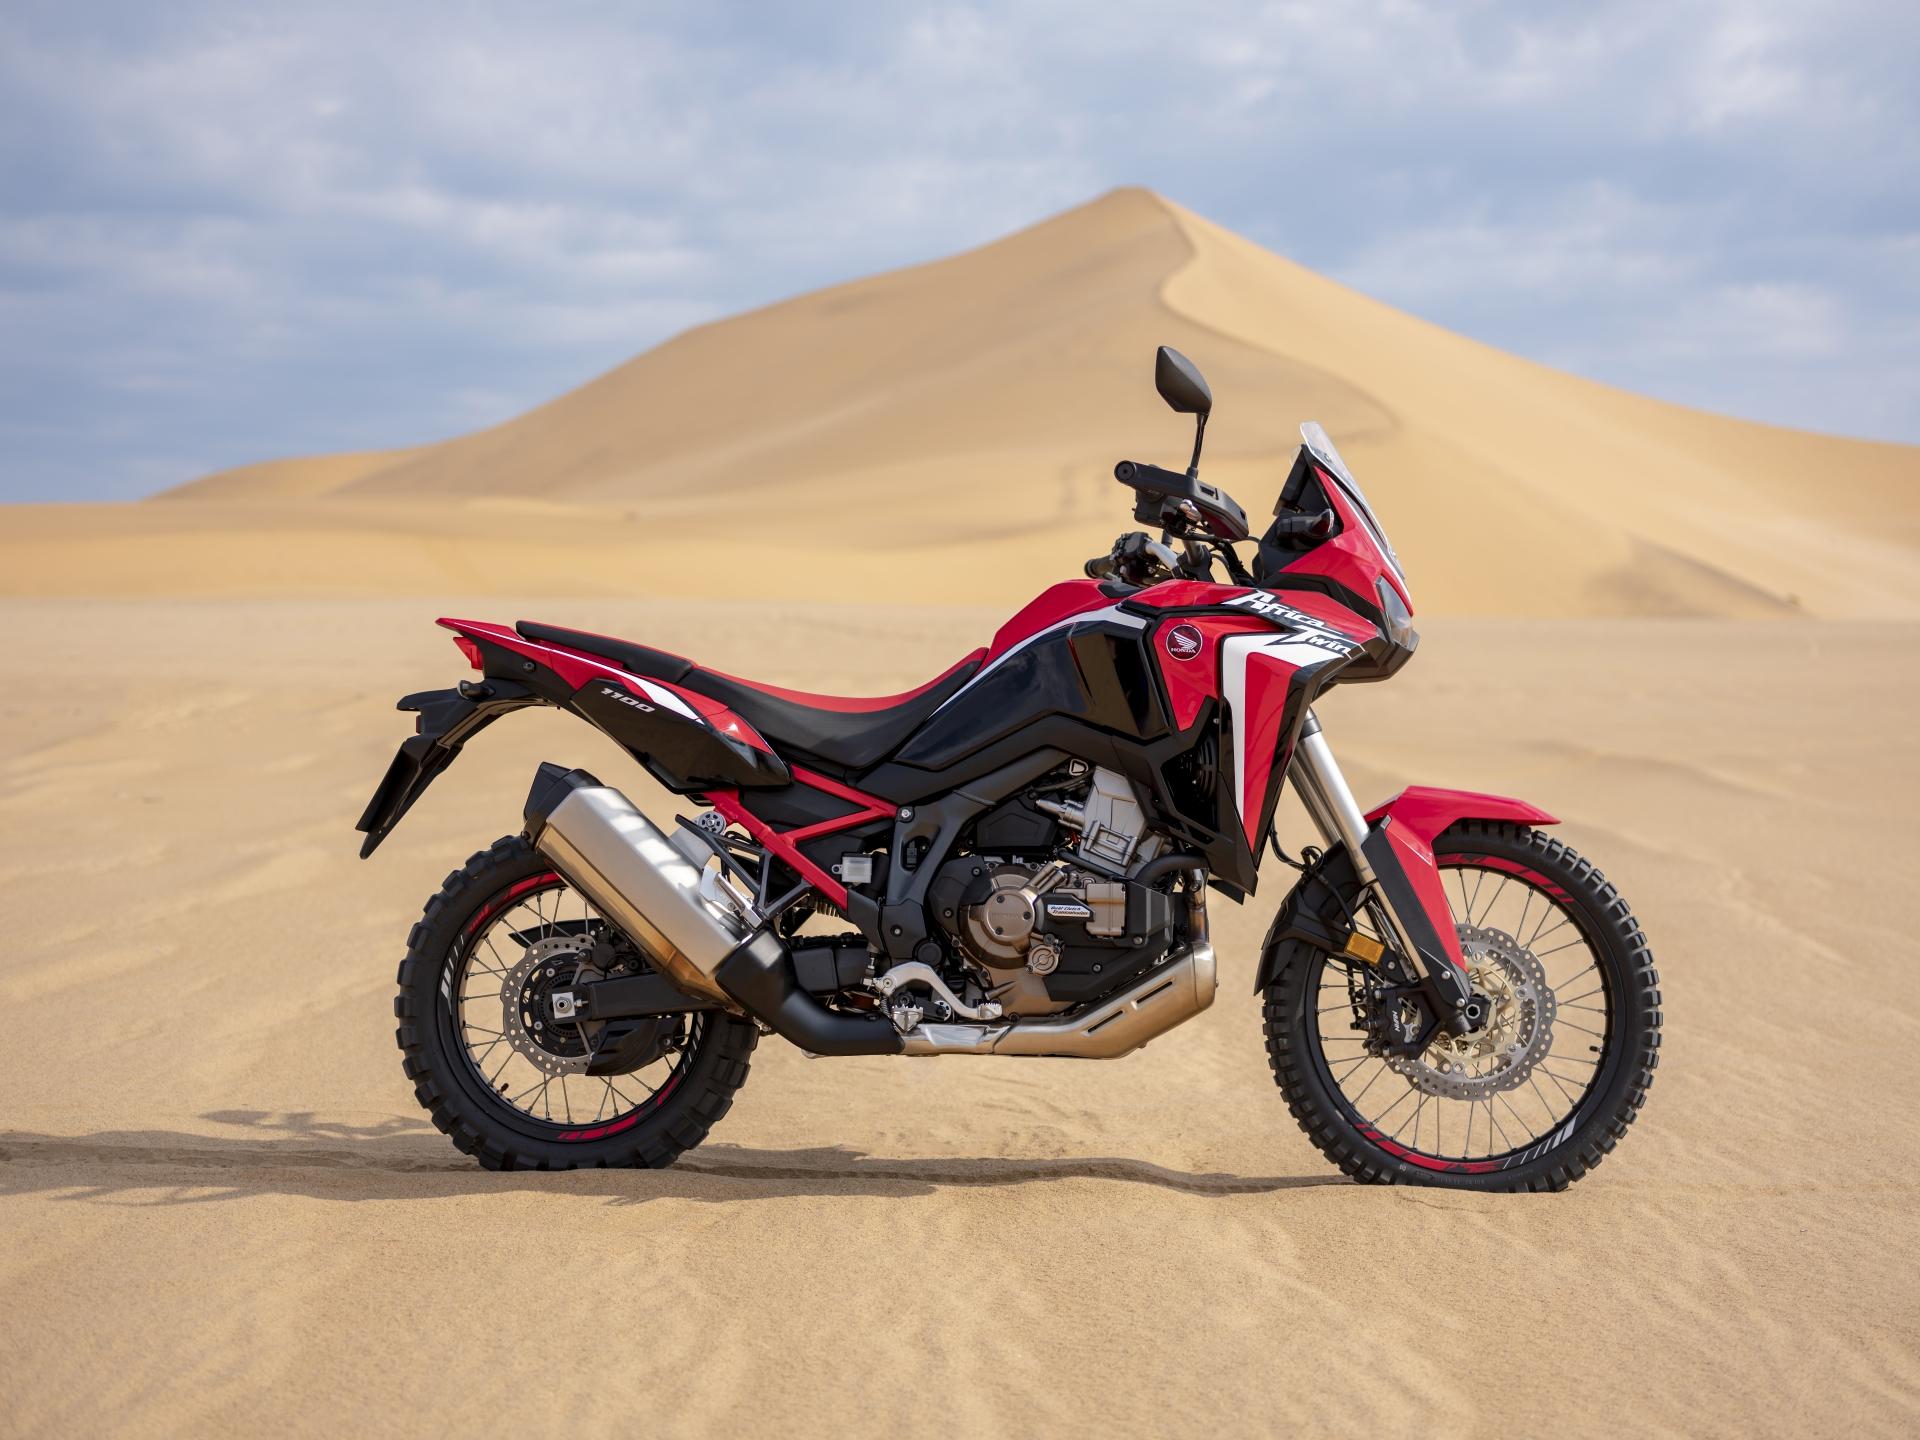 Honda CRF 1100L AfricaTwin